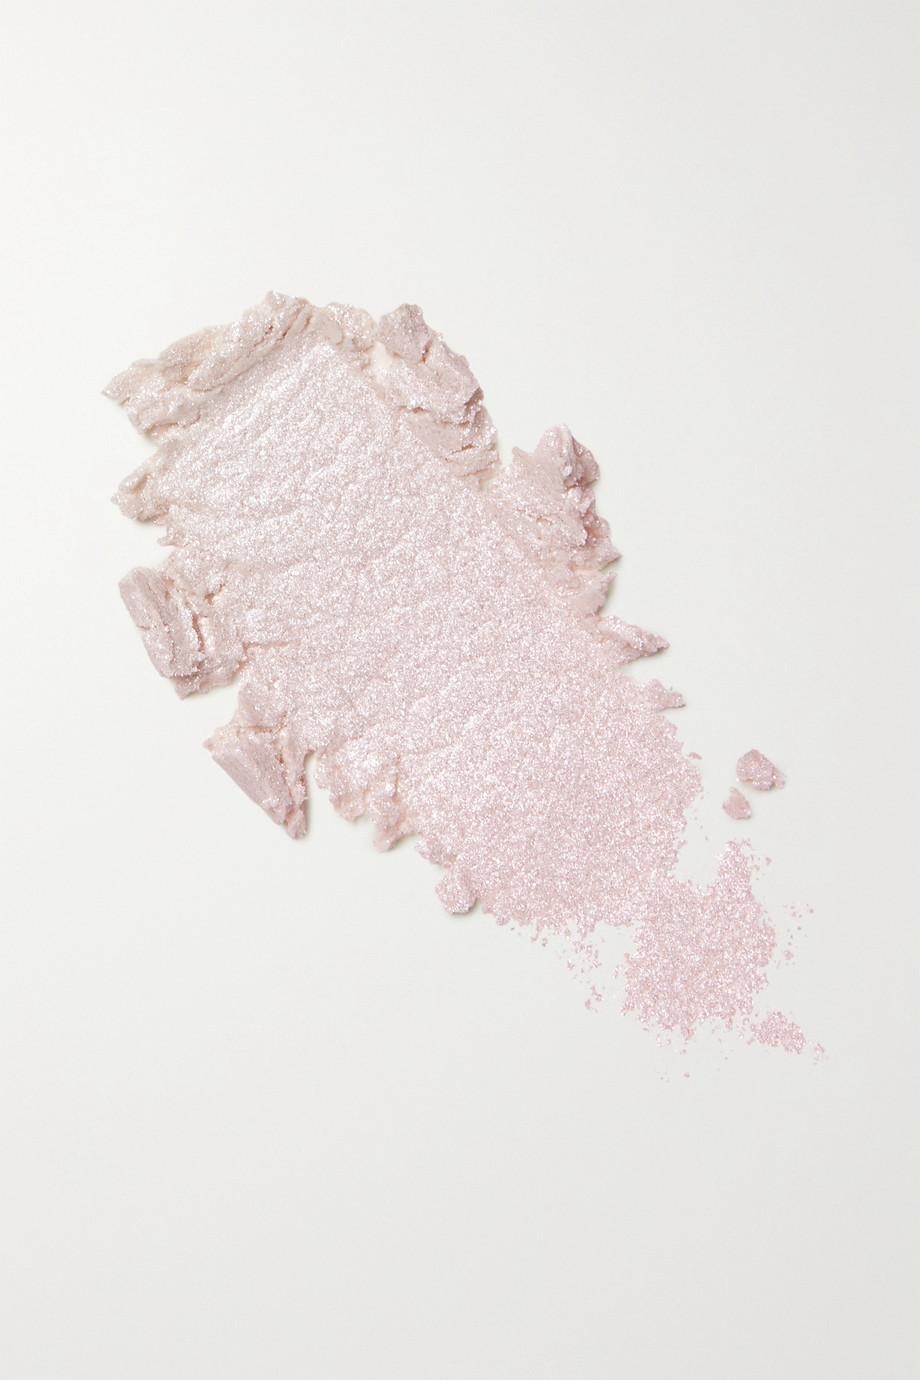 Surratt Beauty Halogram Eyeshadow - Cosmos